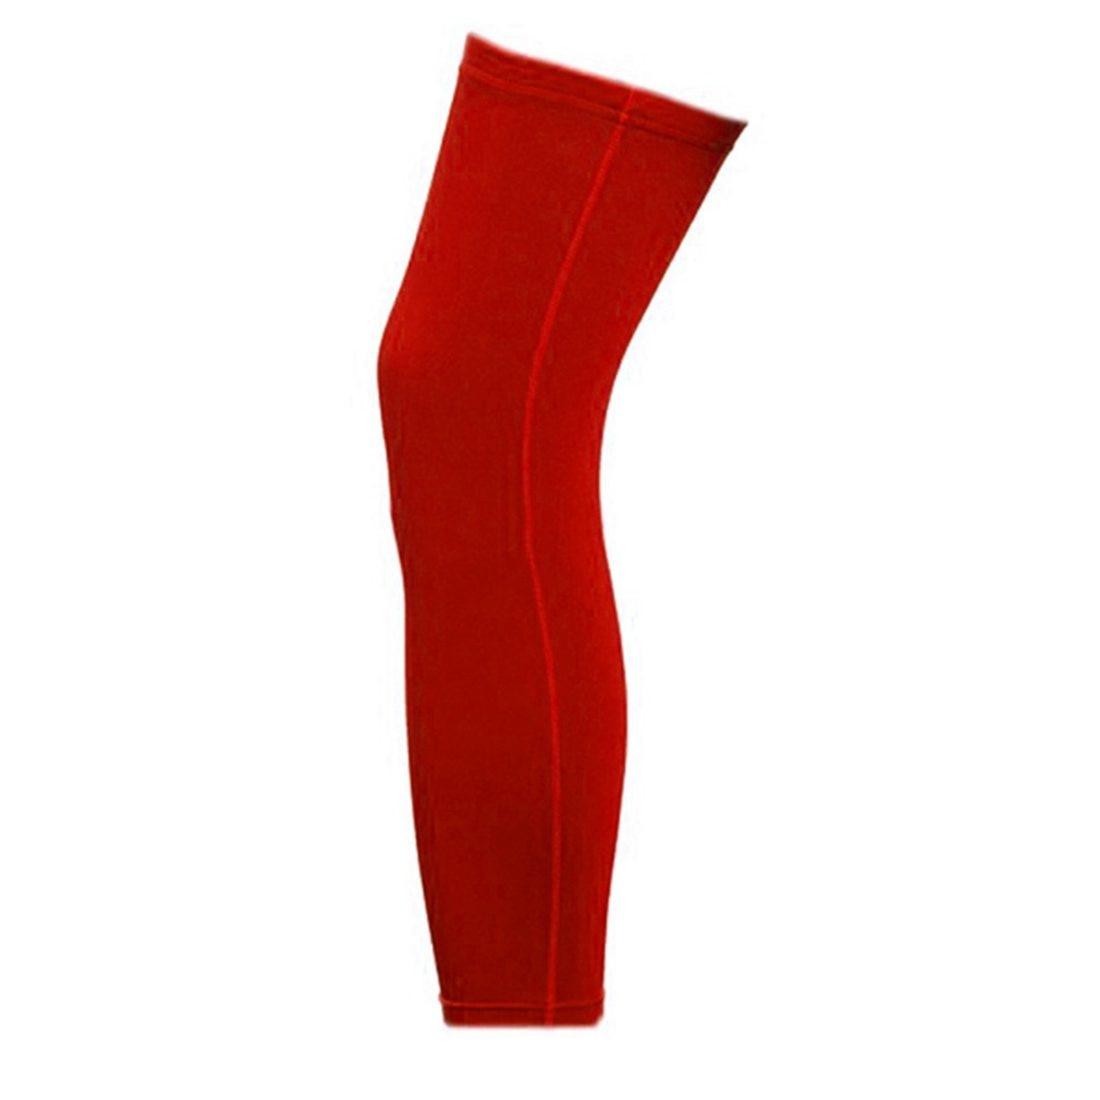 Antislip Leg Knee Protector Gear Cover Long Sleeves Sport Tight Gear Cyclist